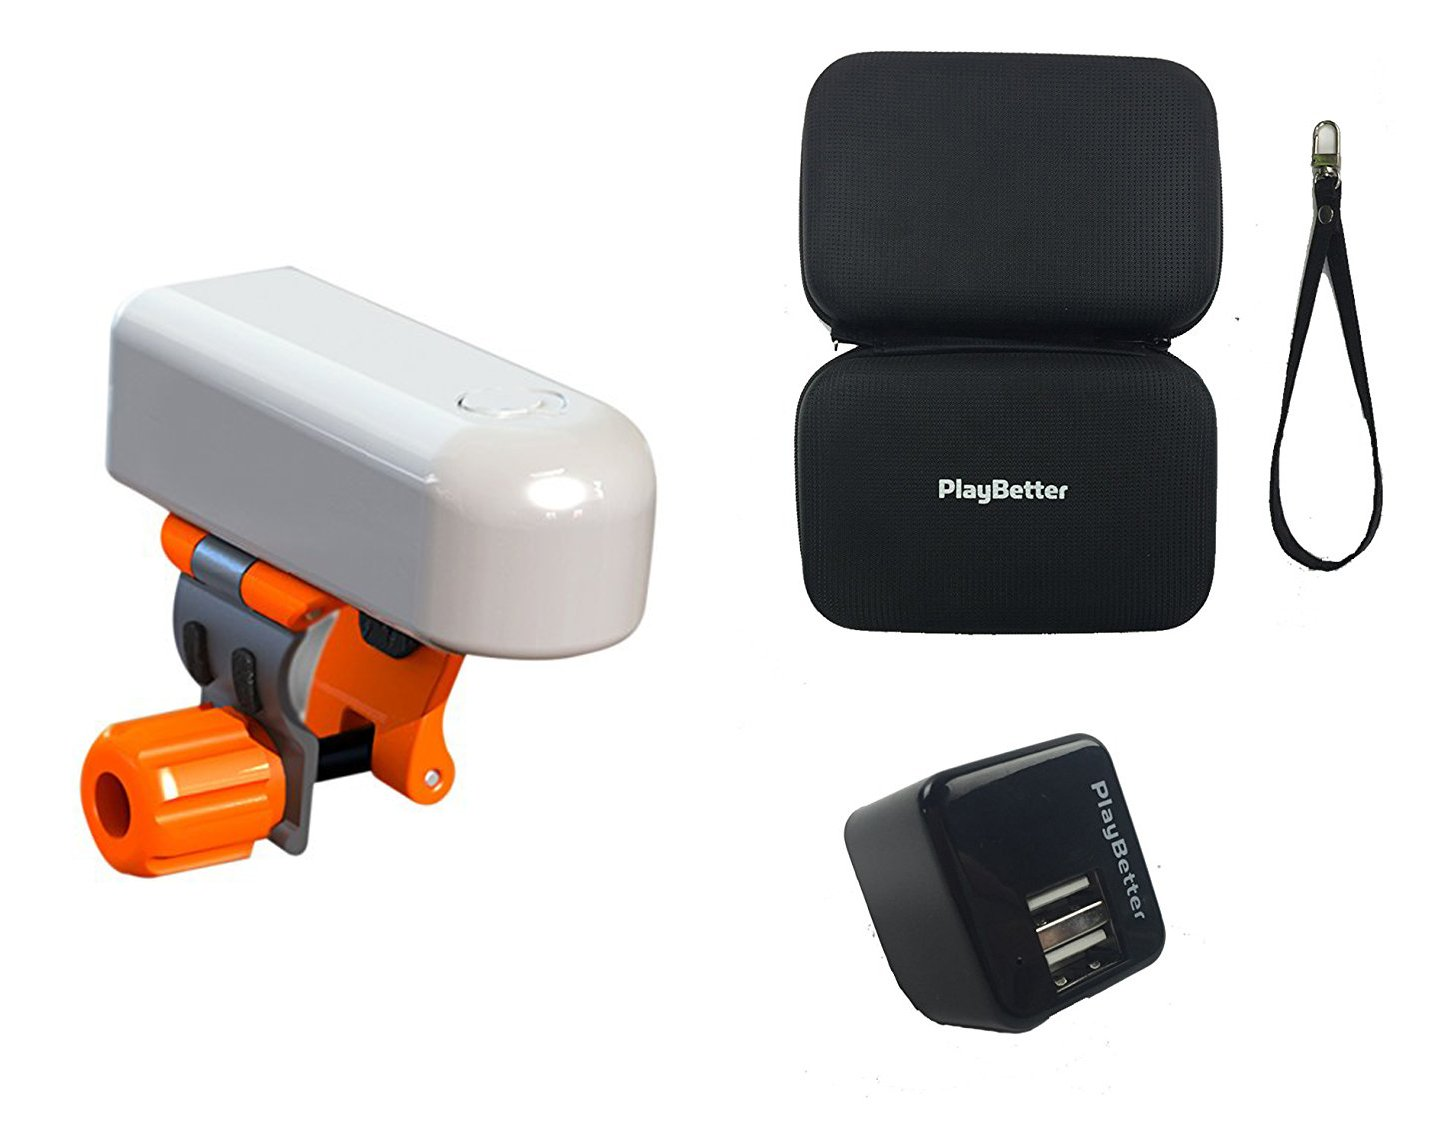 SkyCaddie SkyPro Golf Swing Analyzer BUNDLE with PlayBetter Hard Carry Case & USB Wall Adapter | Instant 3D Swing Analysis